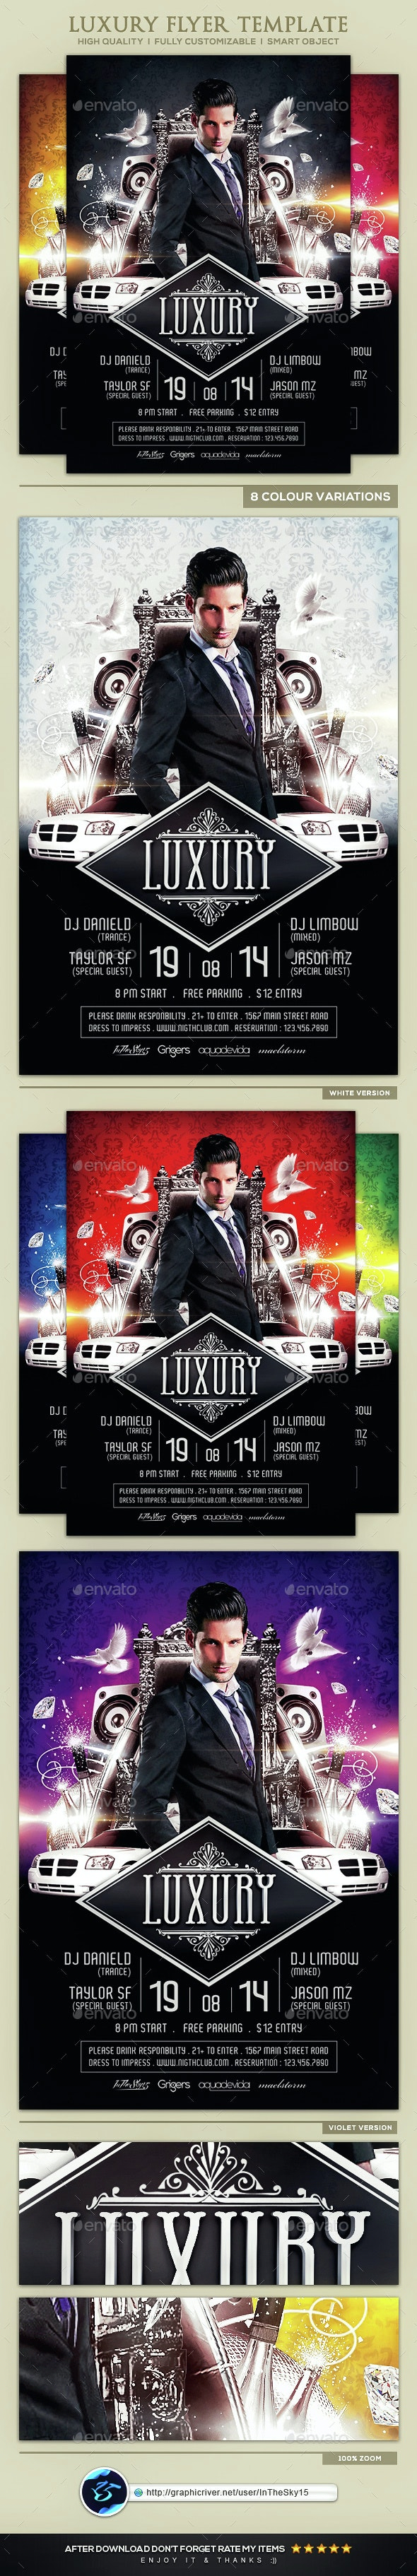 Luxury Flyer Template - Flyers Print Templates